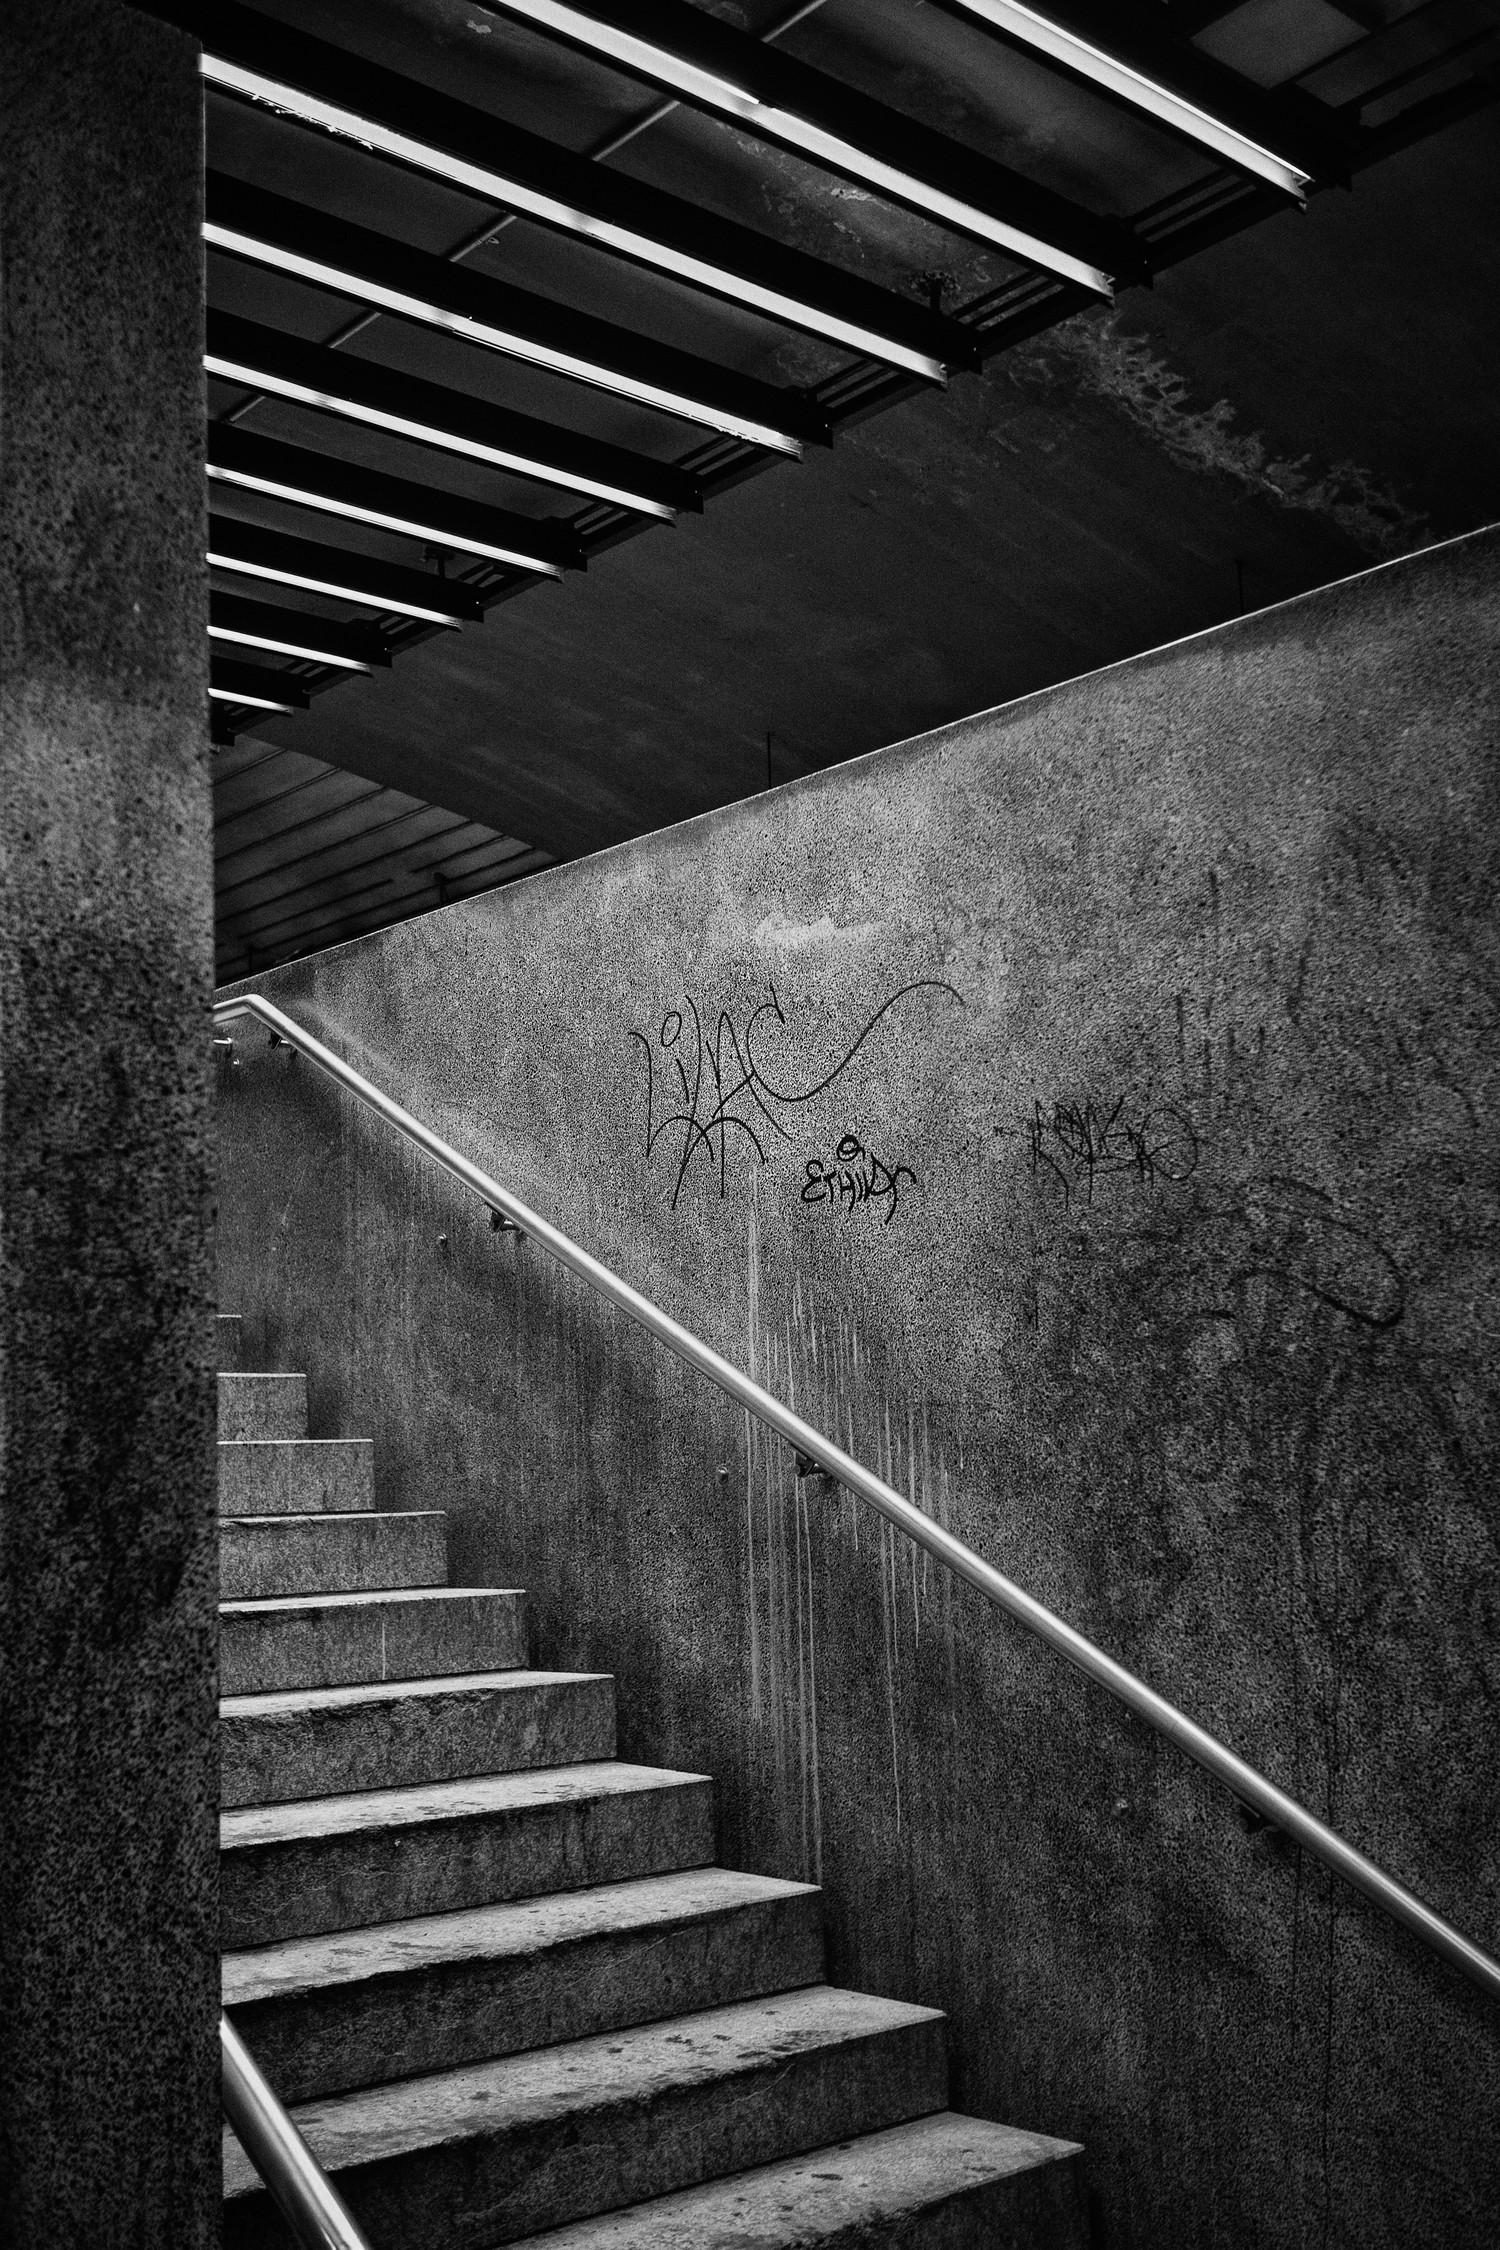 8_Grafitis Metro MTL-0212-19-Opt BnW Final.jpg